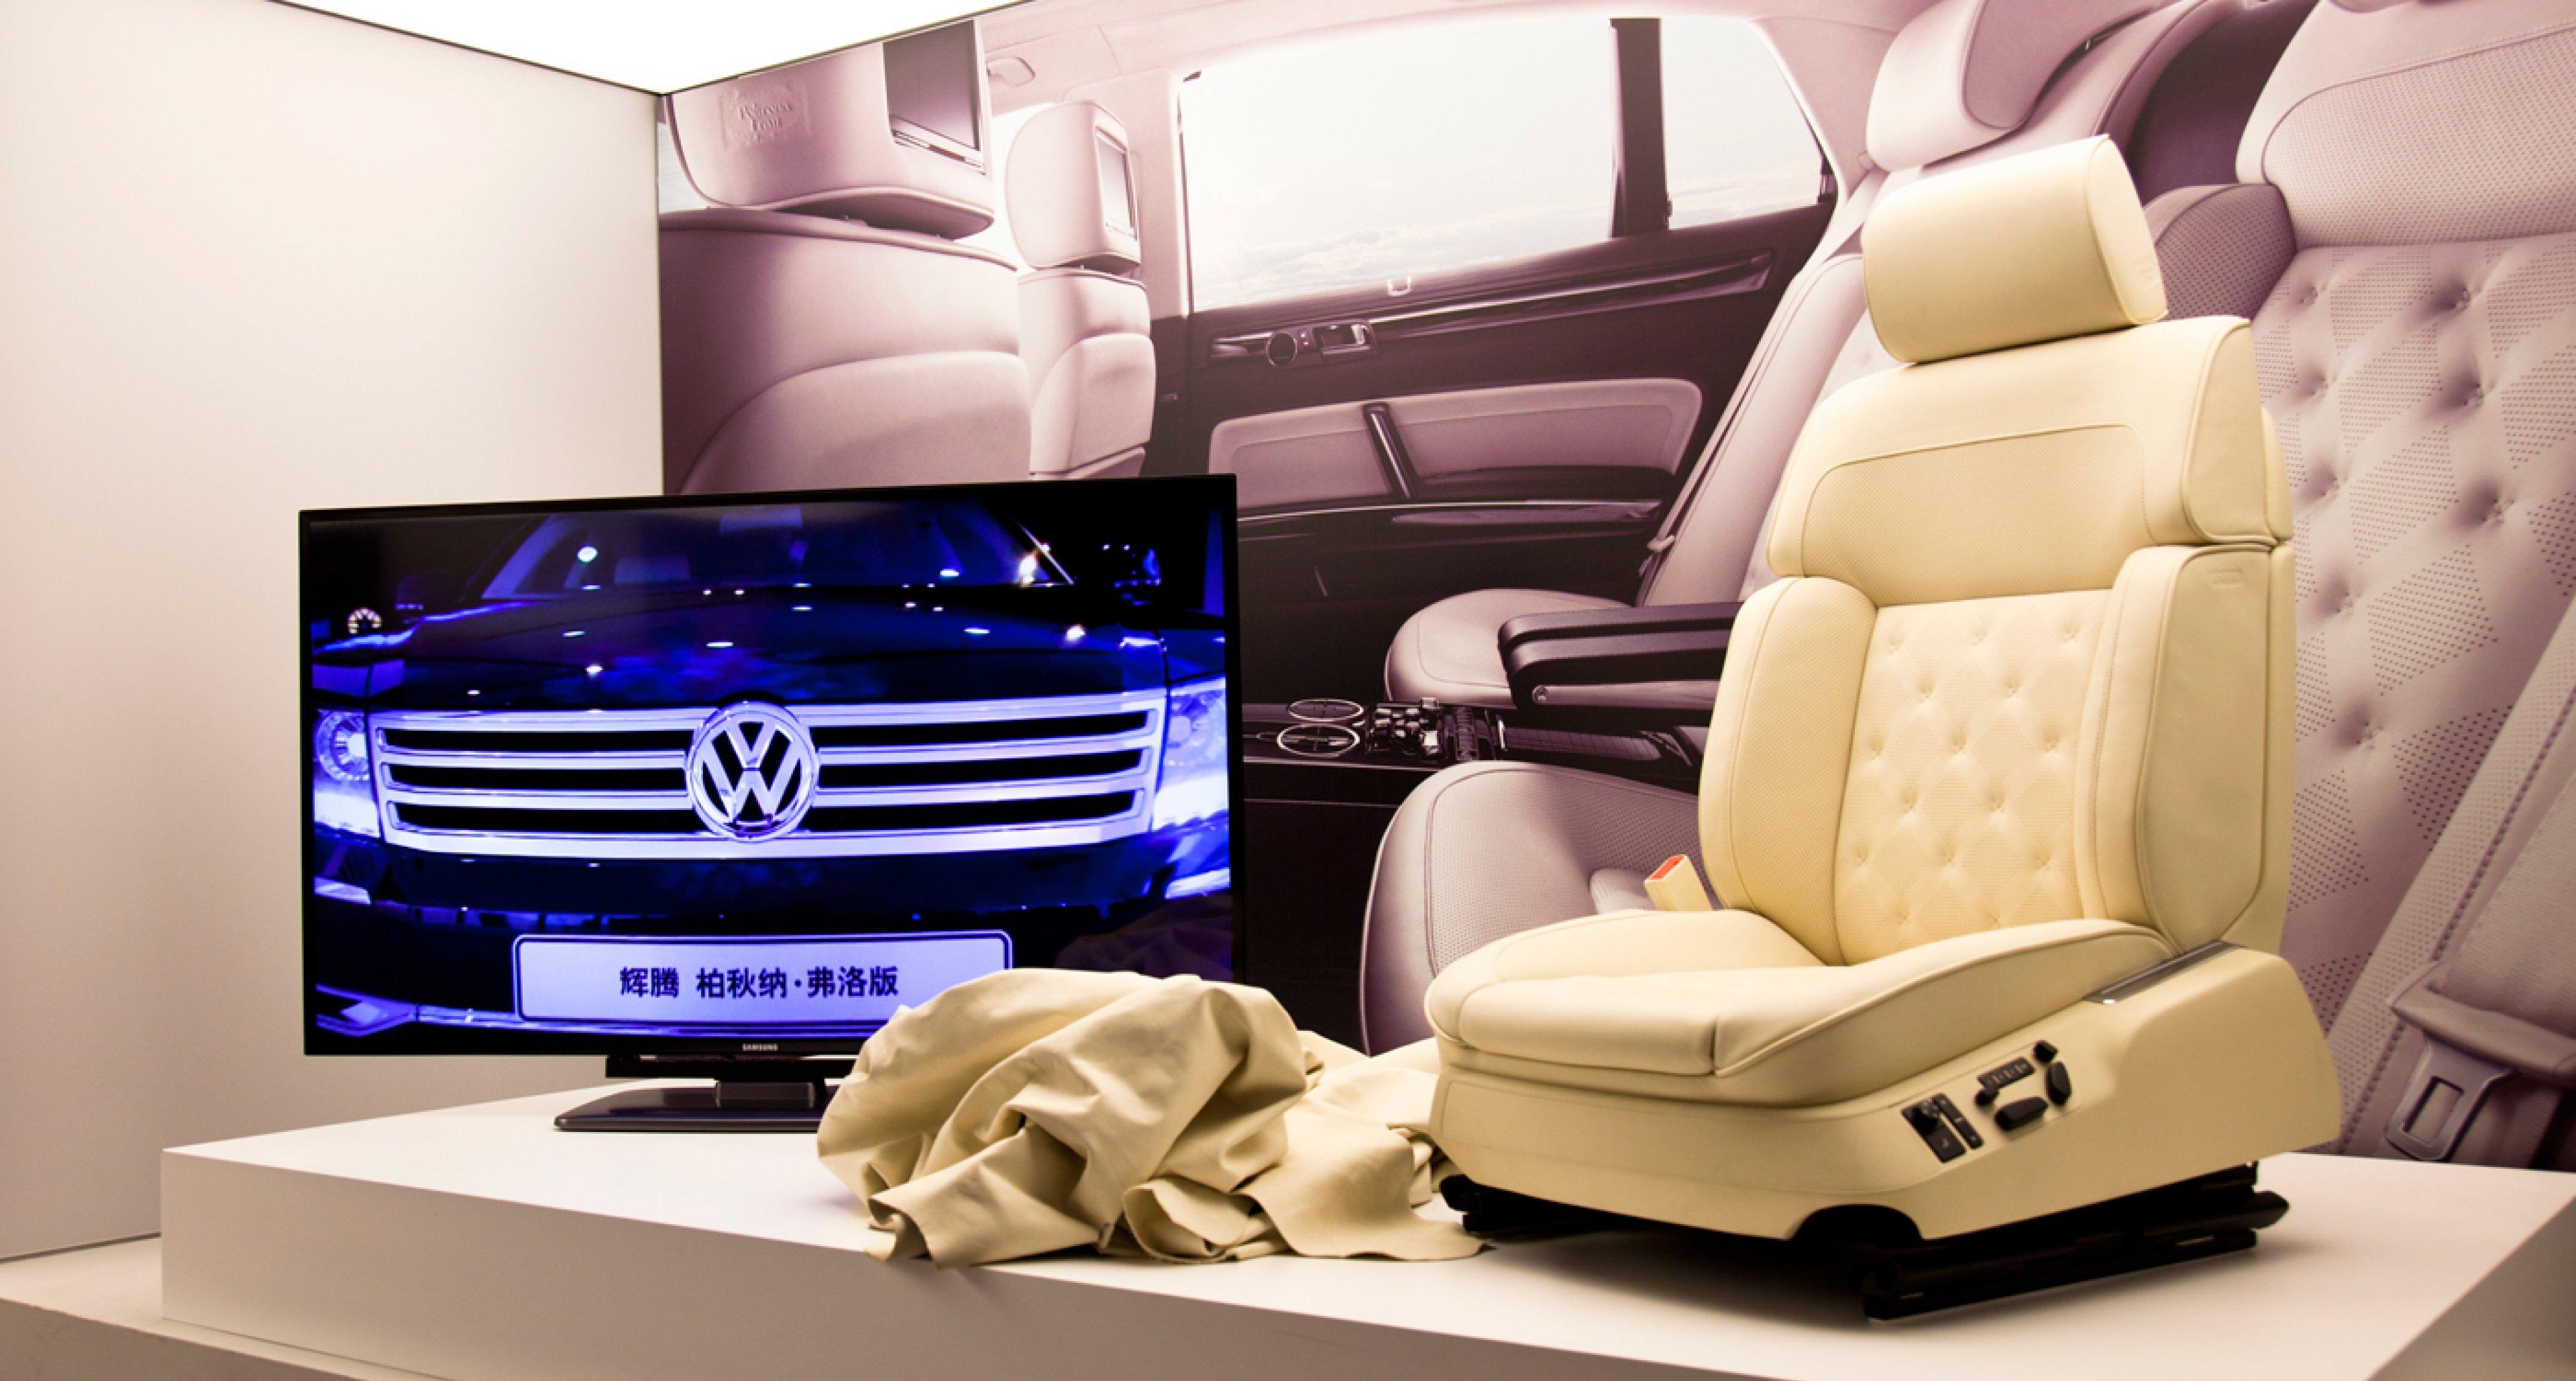 Seat for VW Phaeton at Poltrona Frau Museum.